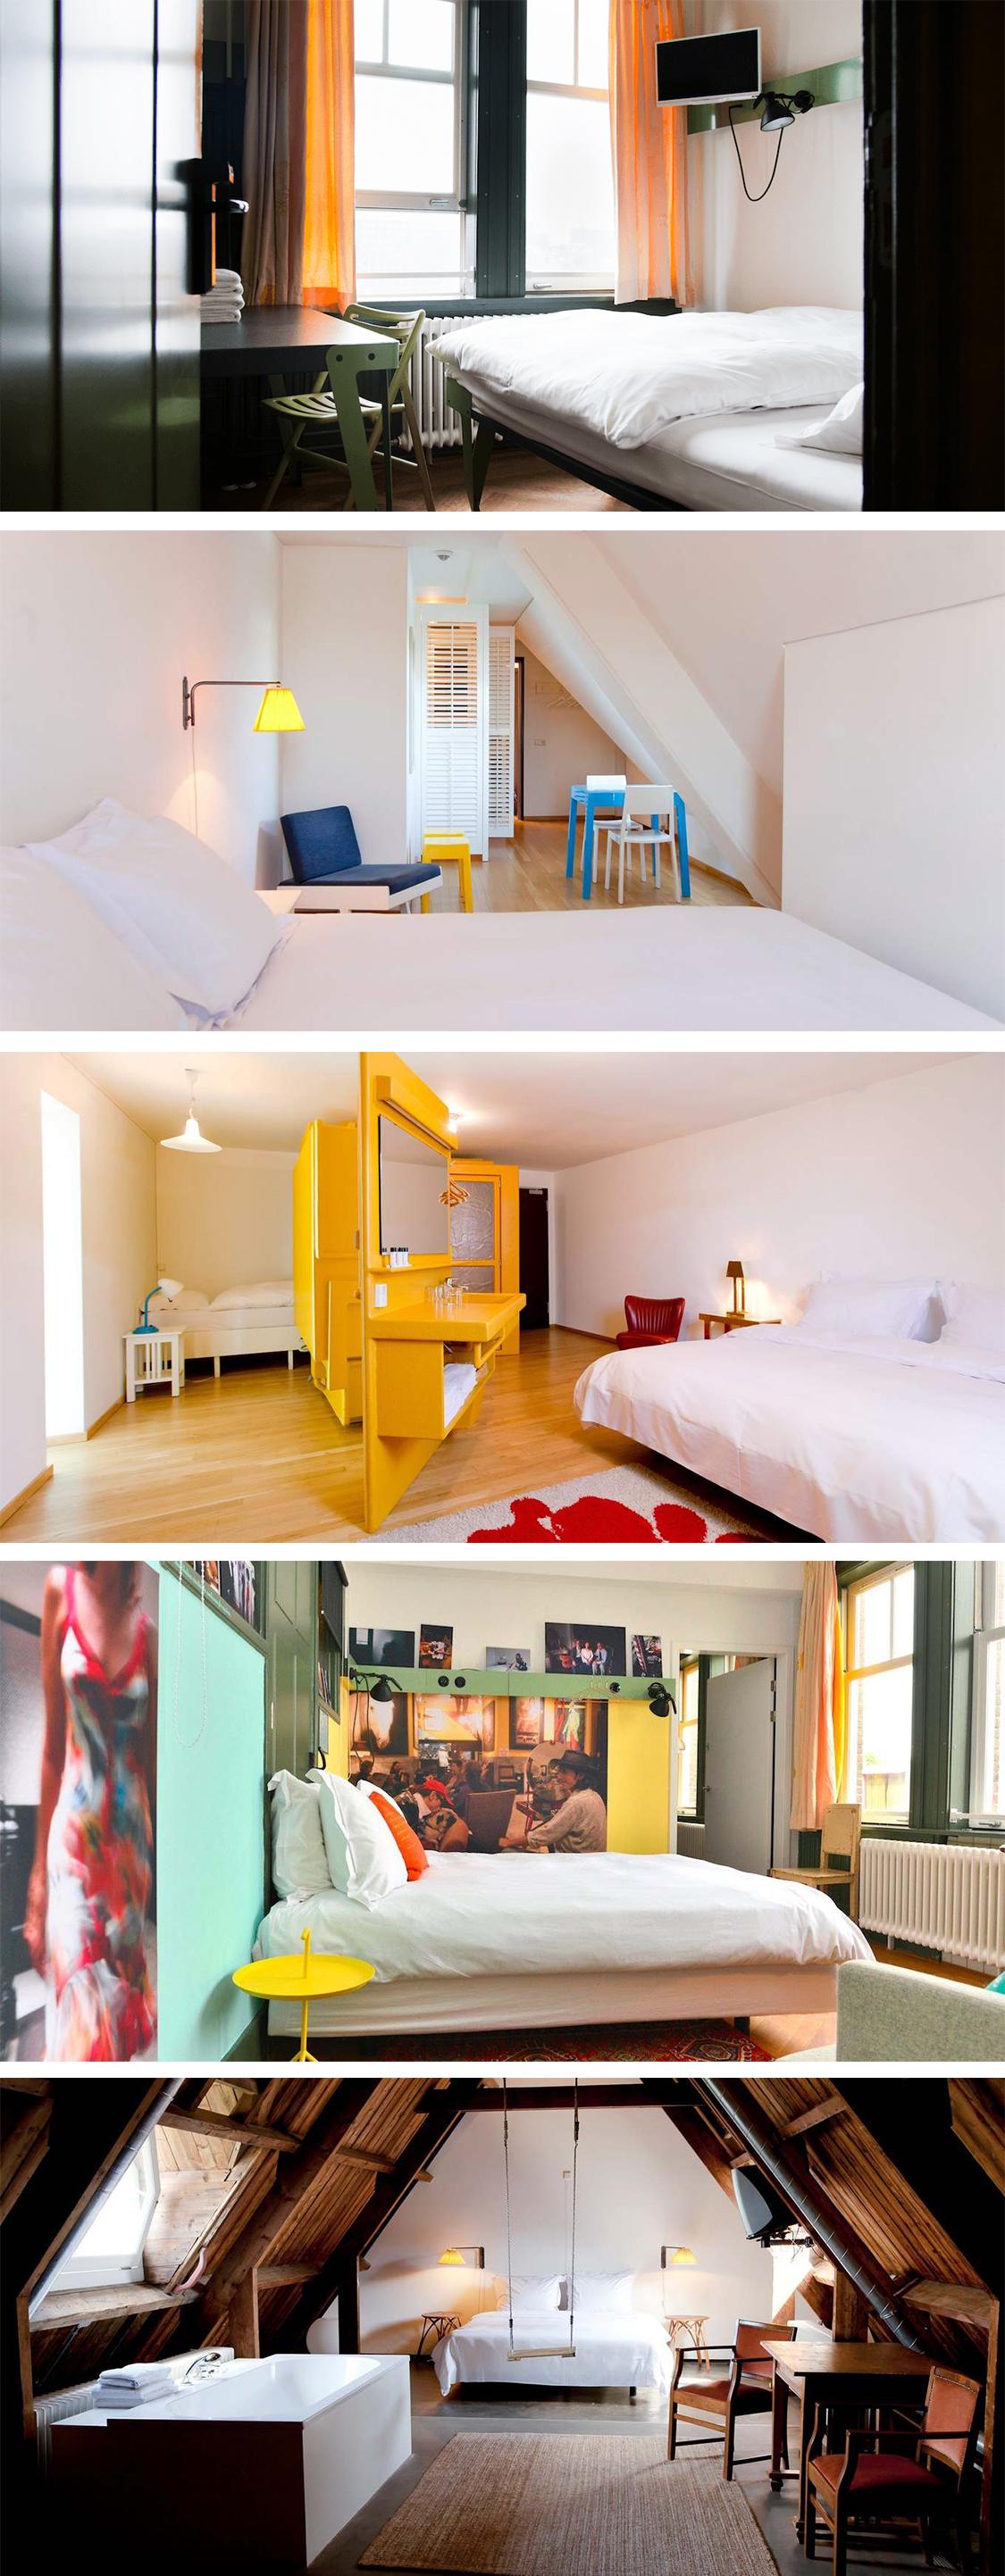 lloyd hotel cultural embassy danielle noce. Black Bedroom Furniture Sets. Home Design Ideas